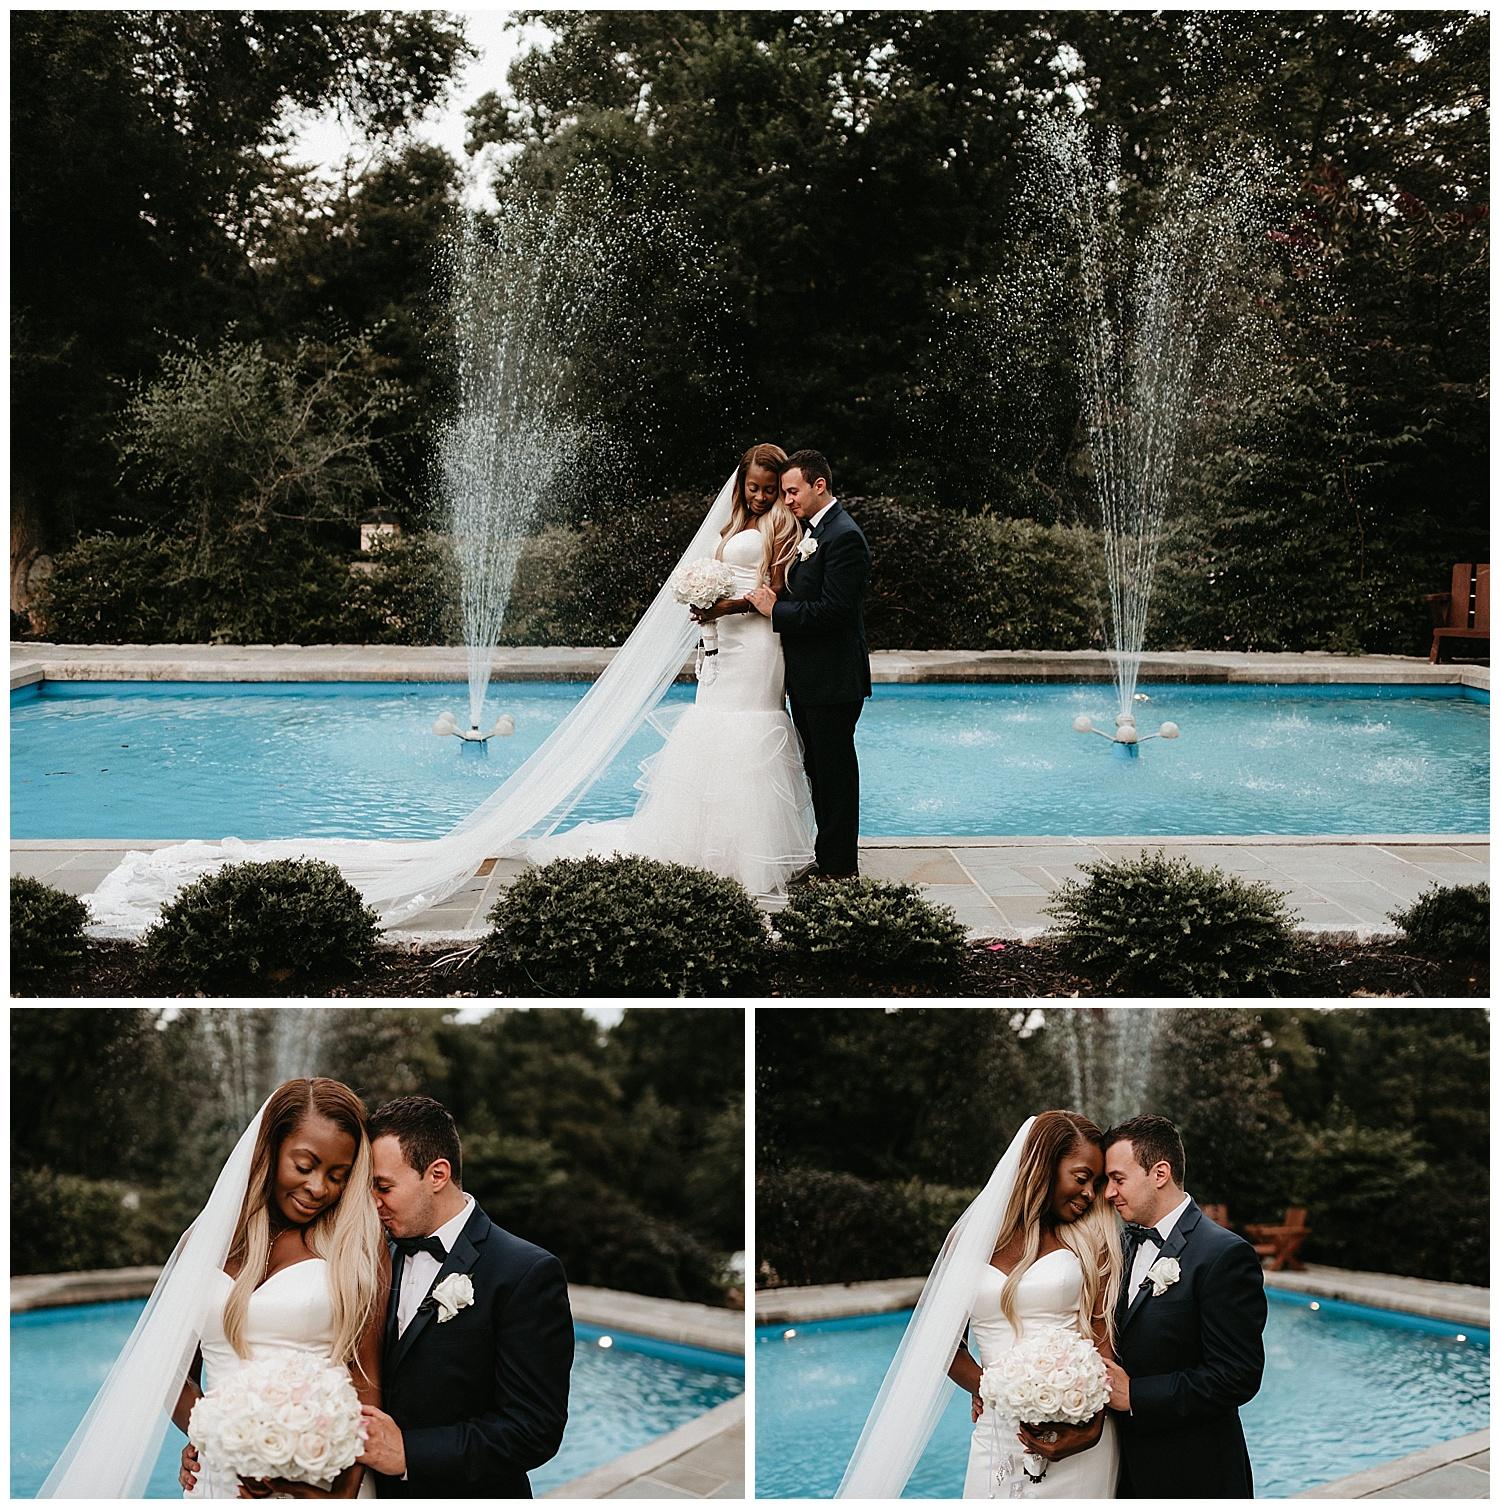 New-Jersey-wedding-photographer-at-Stone-House-at-stirling-ridge-Warren-NJ_0060.jpg